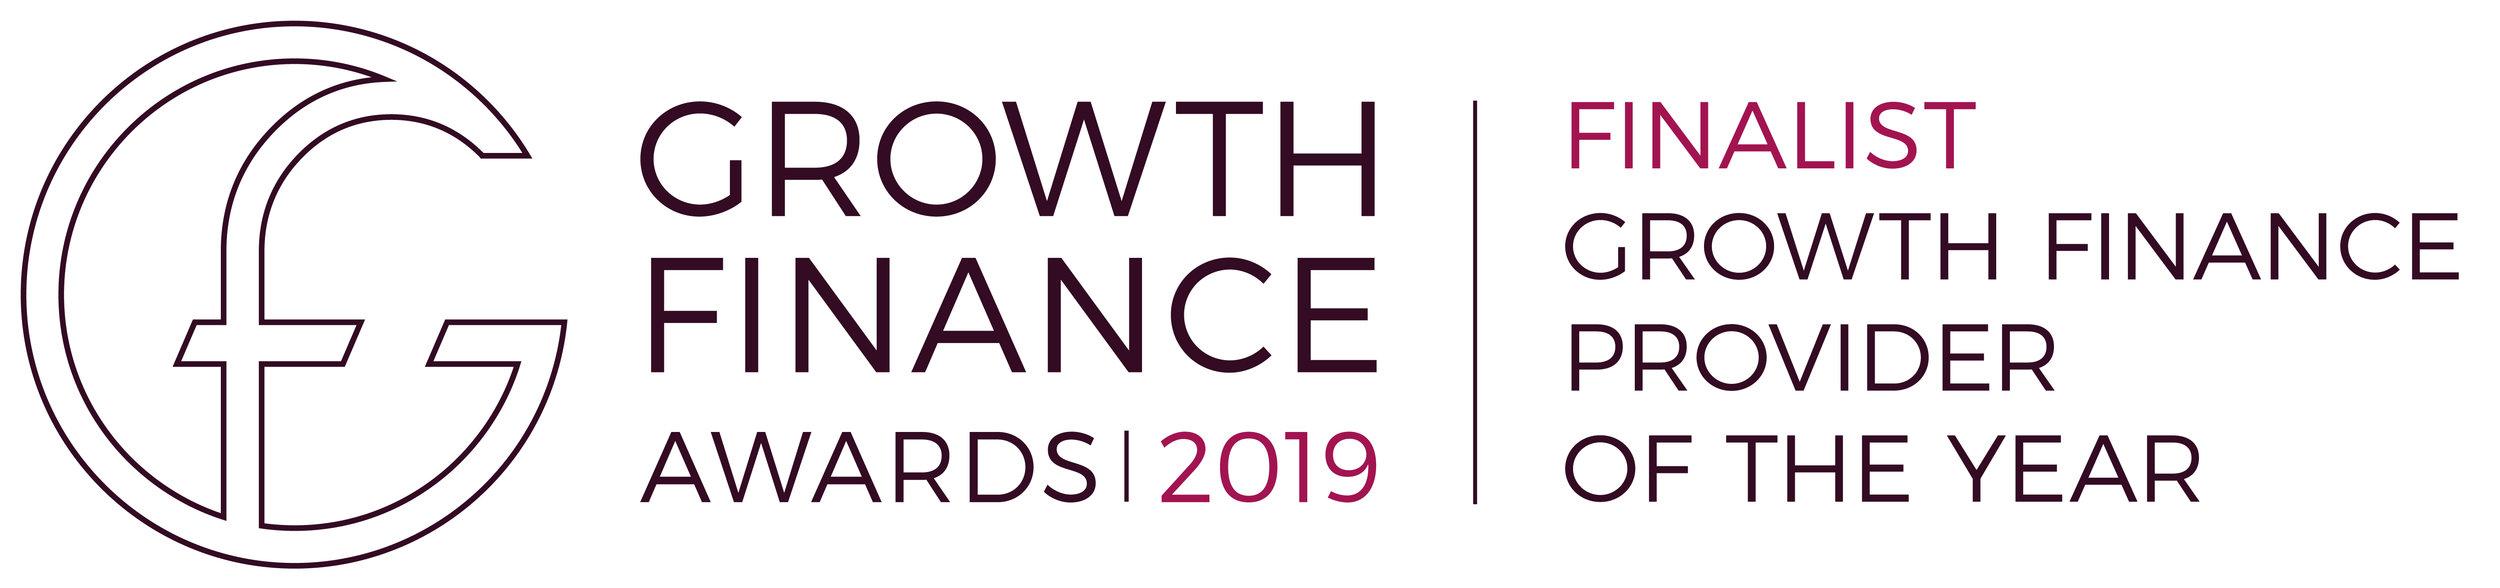 GFA 2019 finalist logo - Growth finance provider of the year.jpg